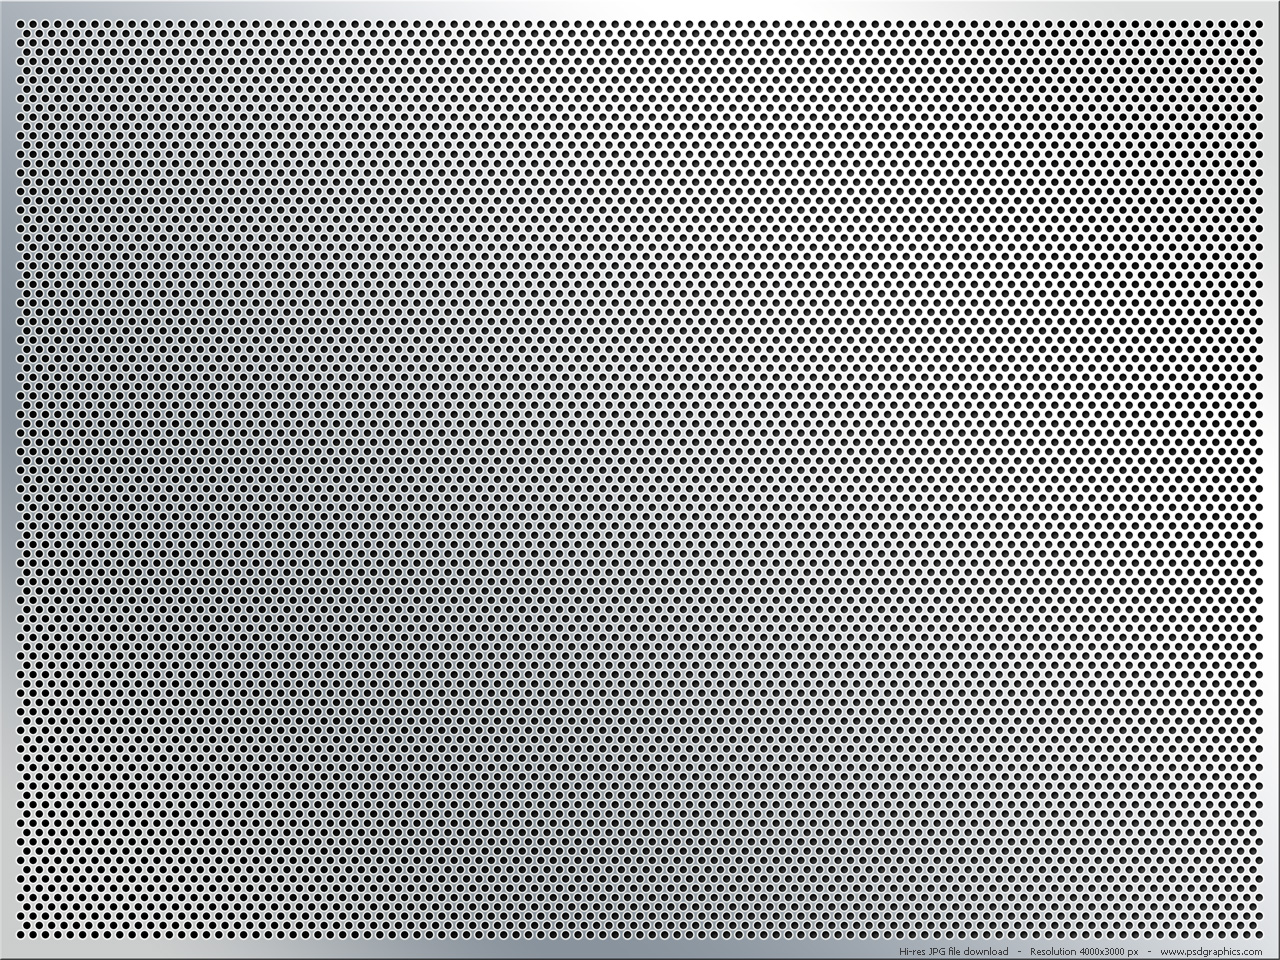 hd cream wallpaper Metallic Silver Wallpaper 1280x960